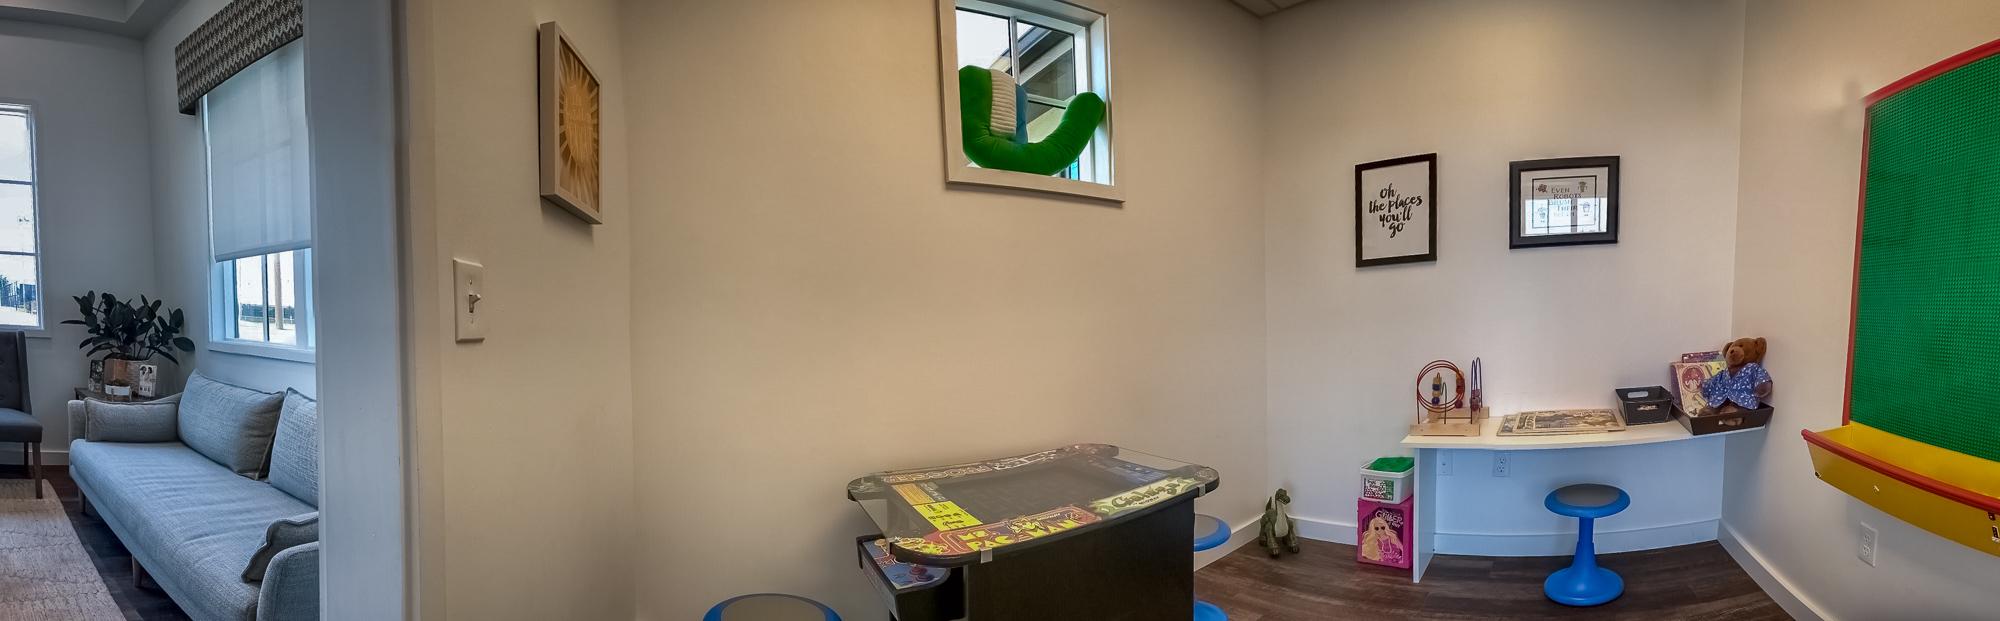 Kids Area Full | Wallace | Edmond | OK | Indoors | Color | wide panorama | Web Ready.jpg